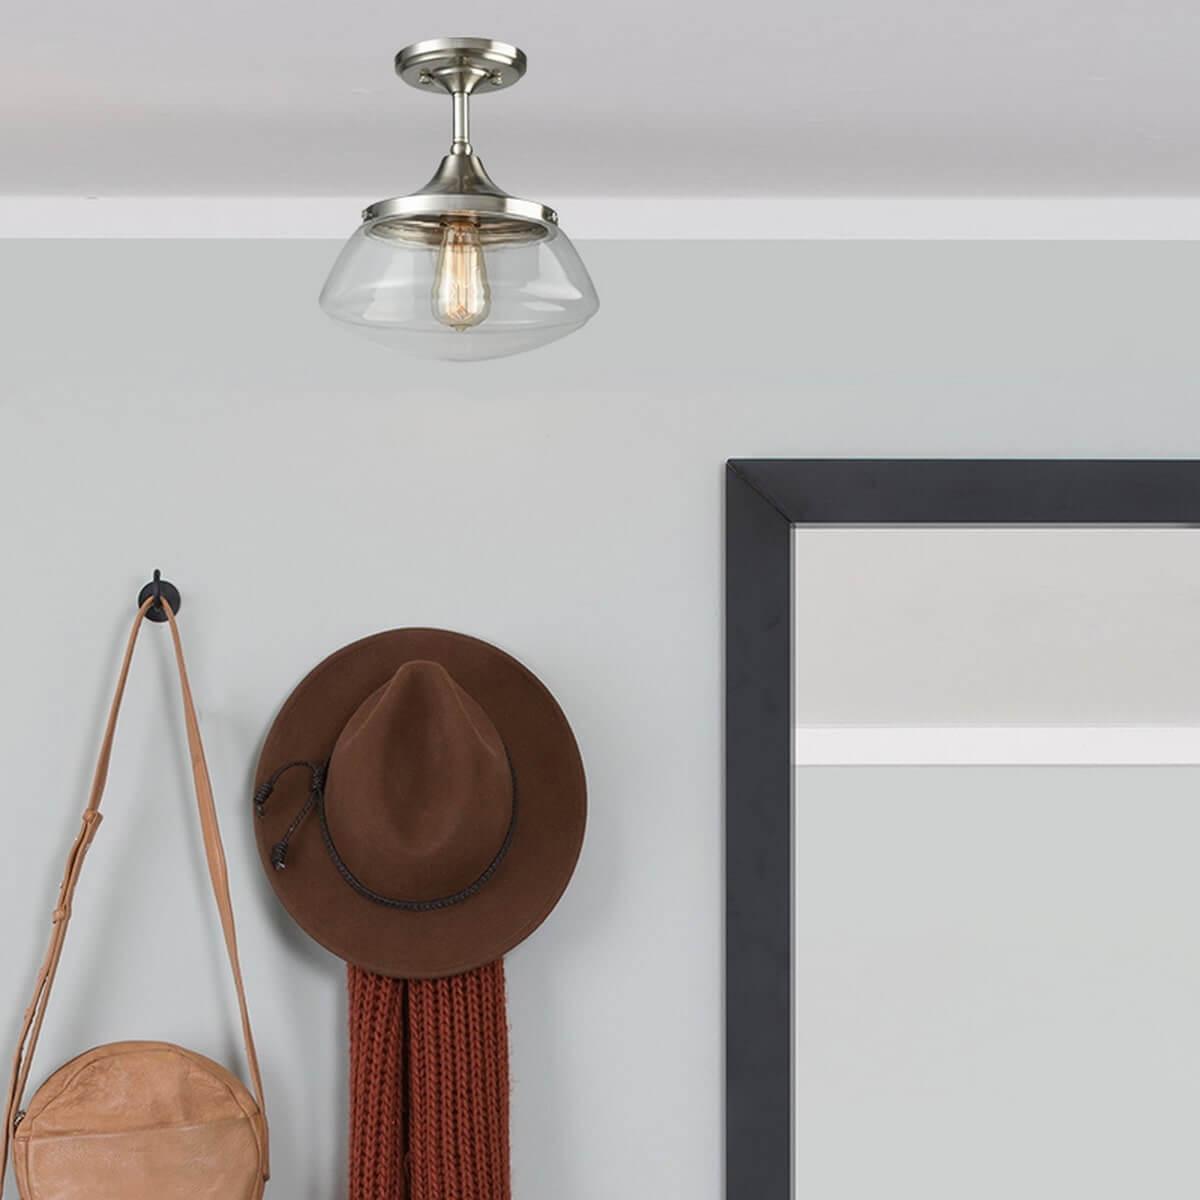 Modern Brushed Nickel Semi Flush Mount Ceiling Light